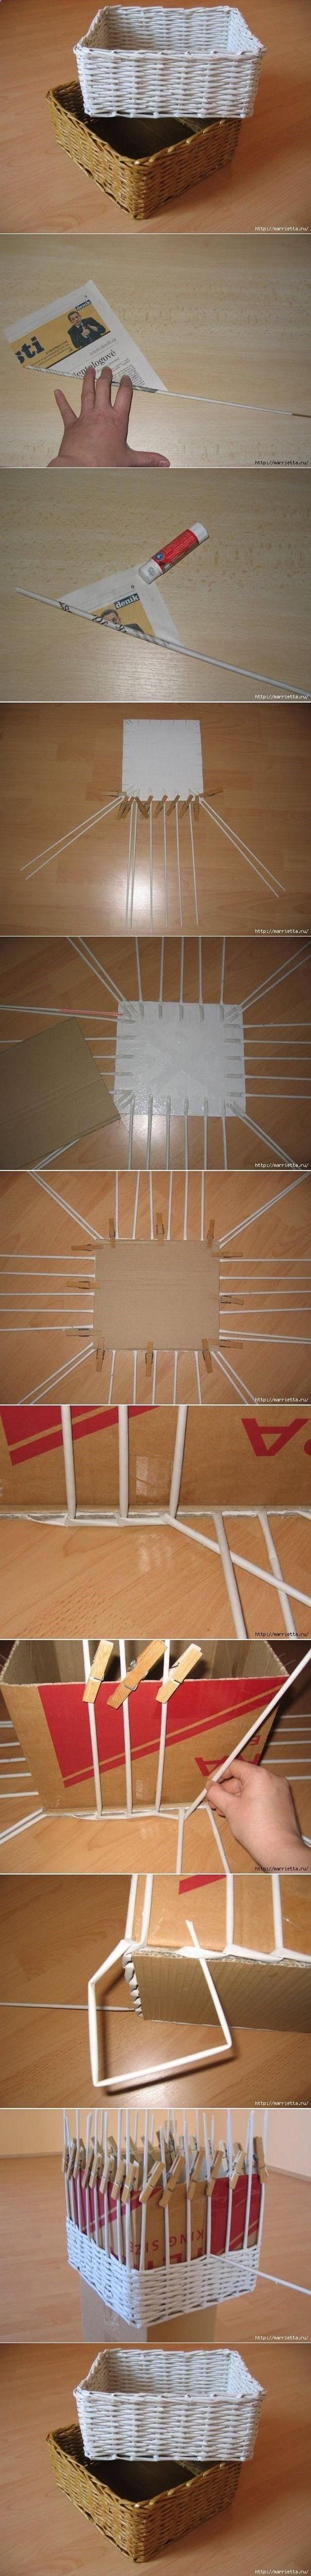 DIY Recycled Paper Basket